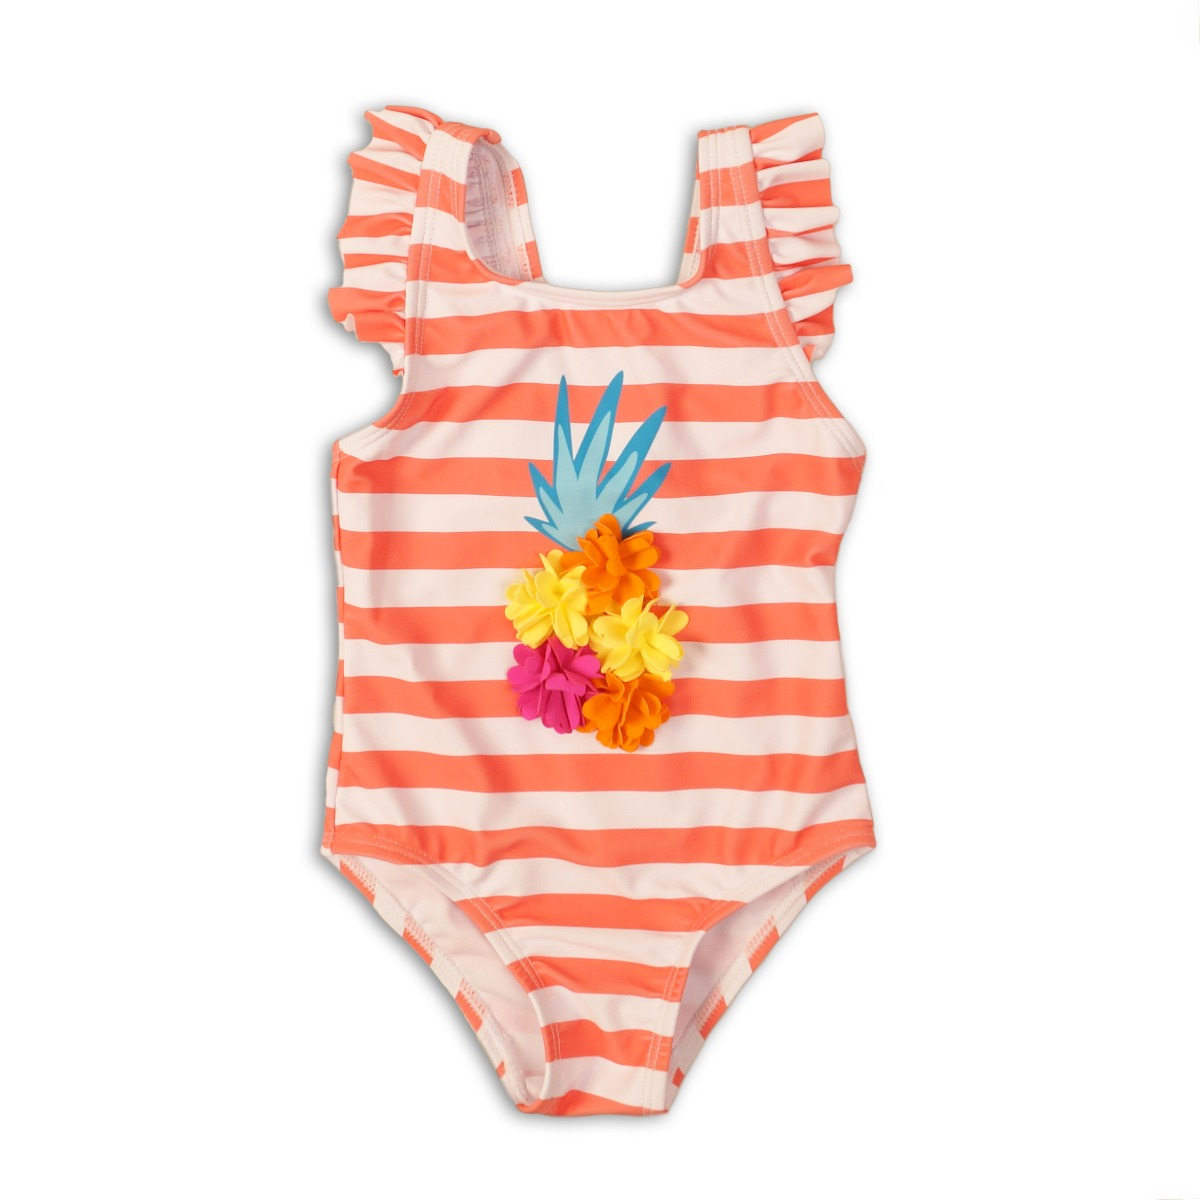 Costum de baie cu volane Minoti Swim imagine